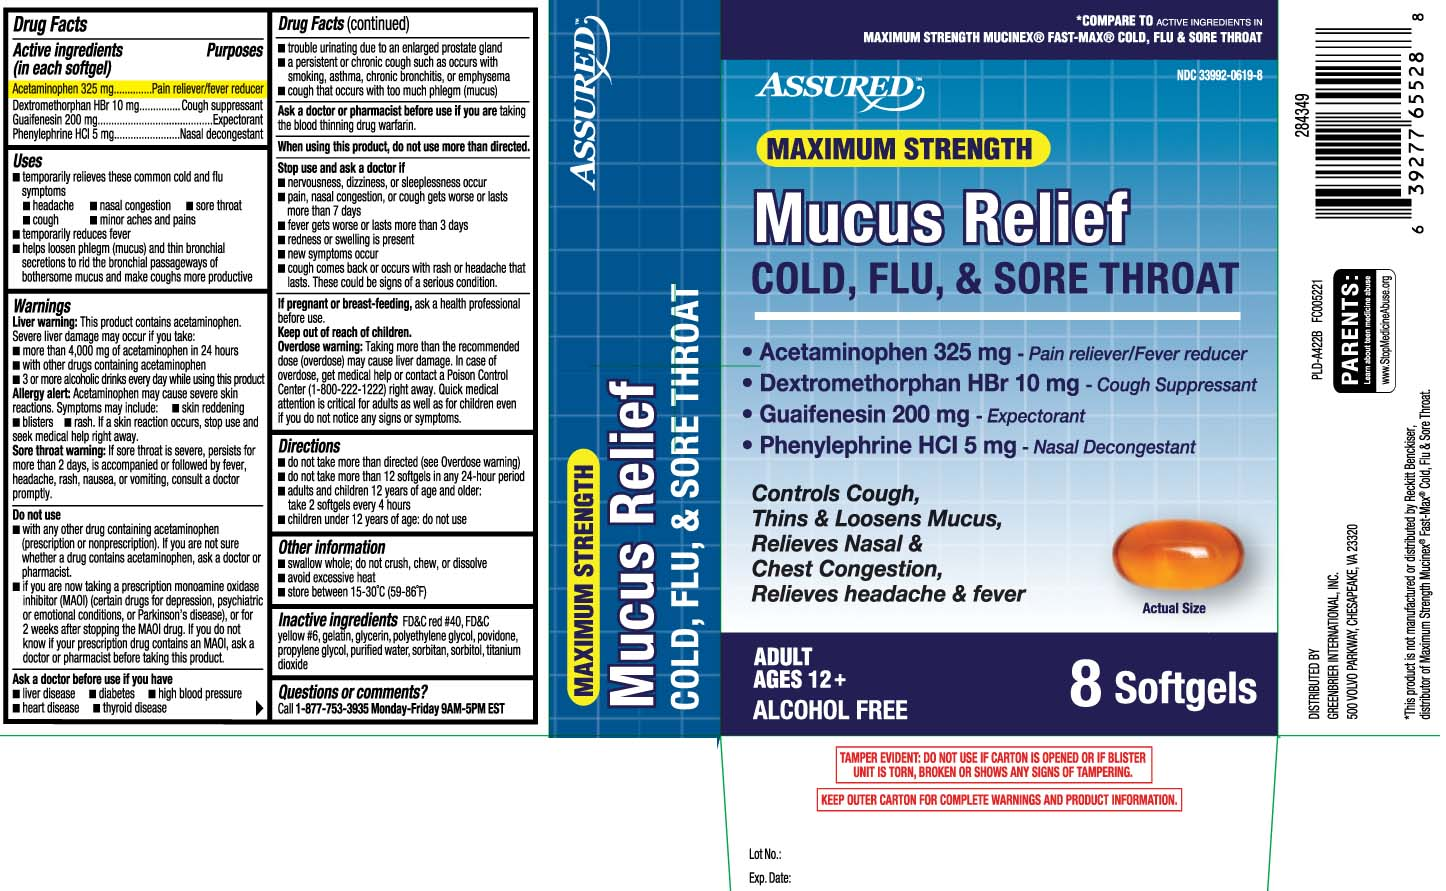 Acetaminophen 325 mg, Dextromethorphan HBr 10 mg, Guaifenesin 200 mg, Phenylephrine HCI 5 mg